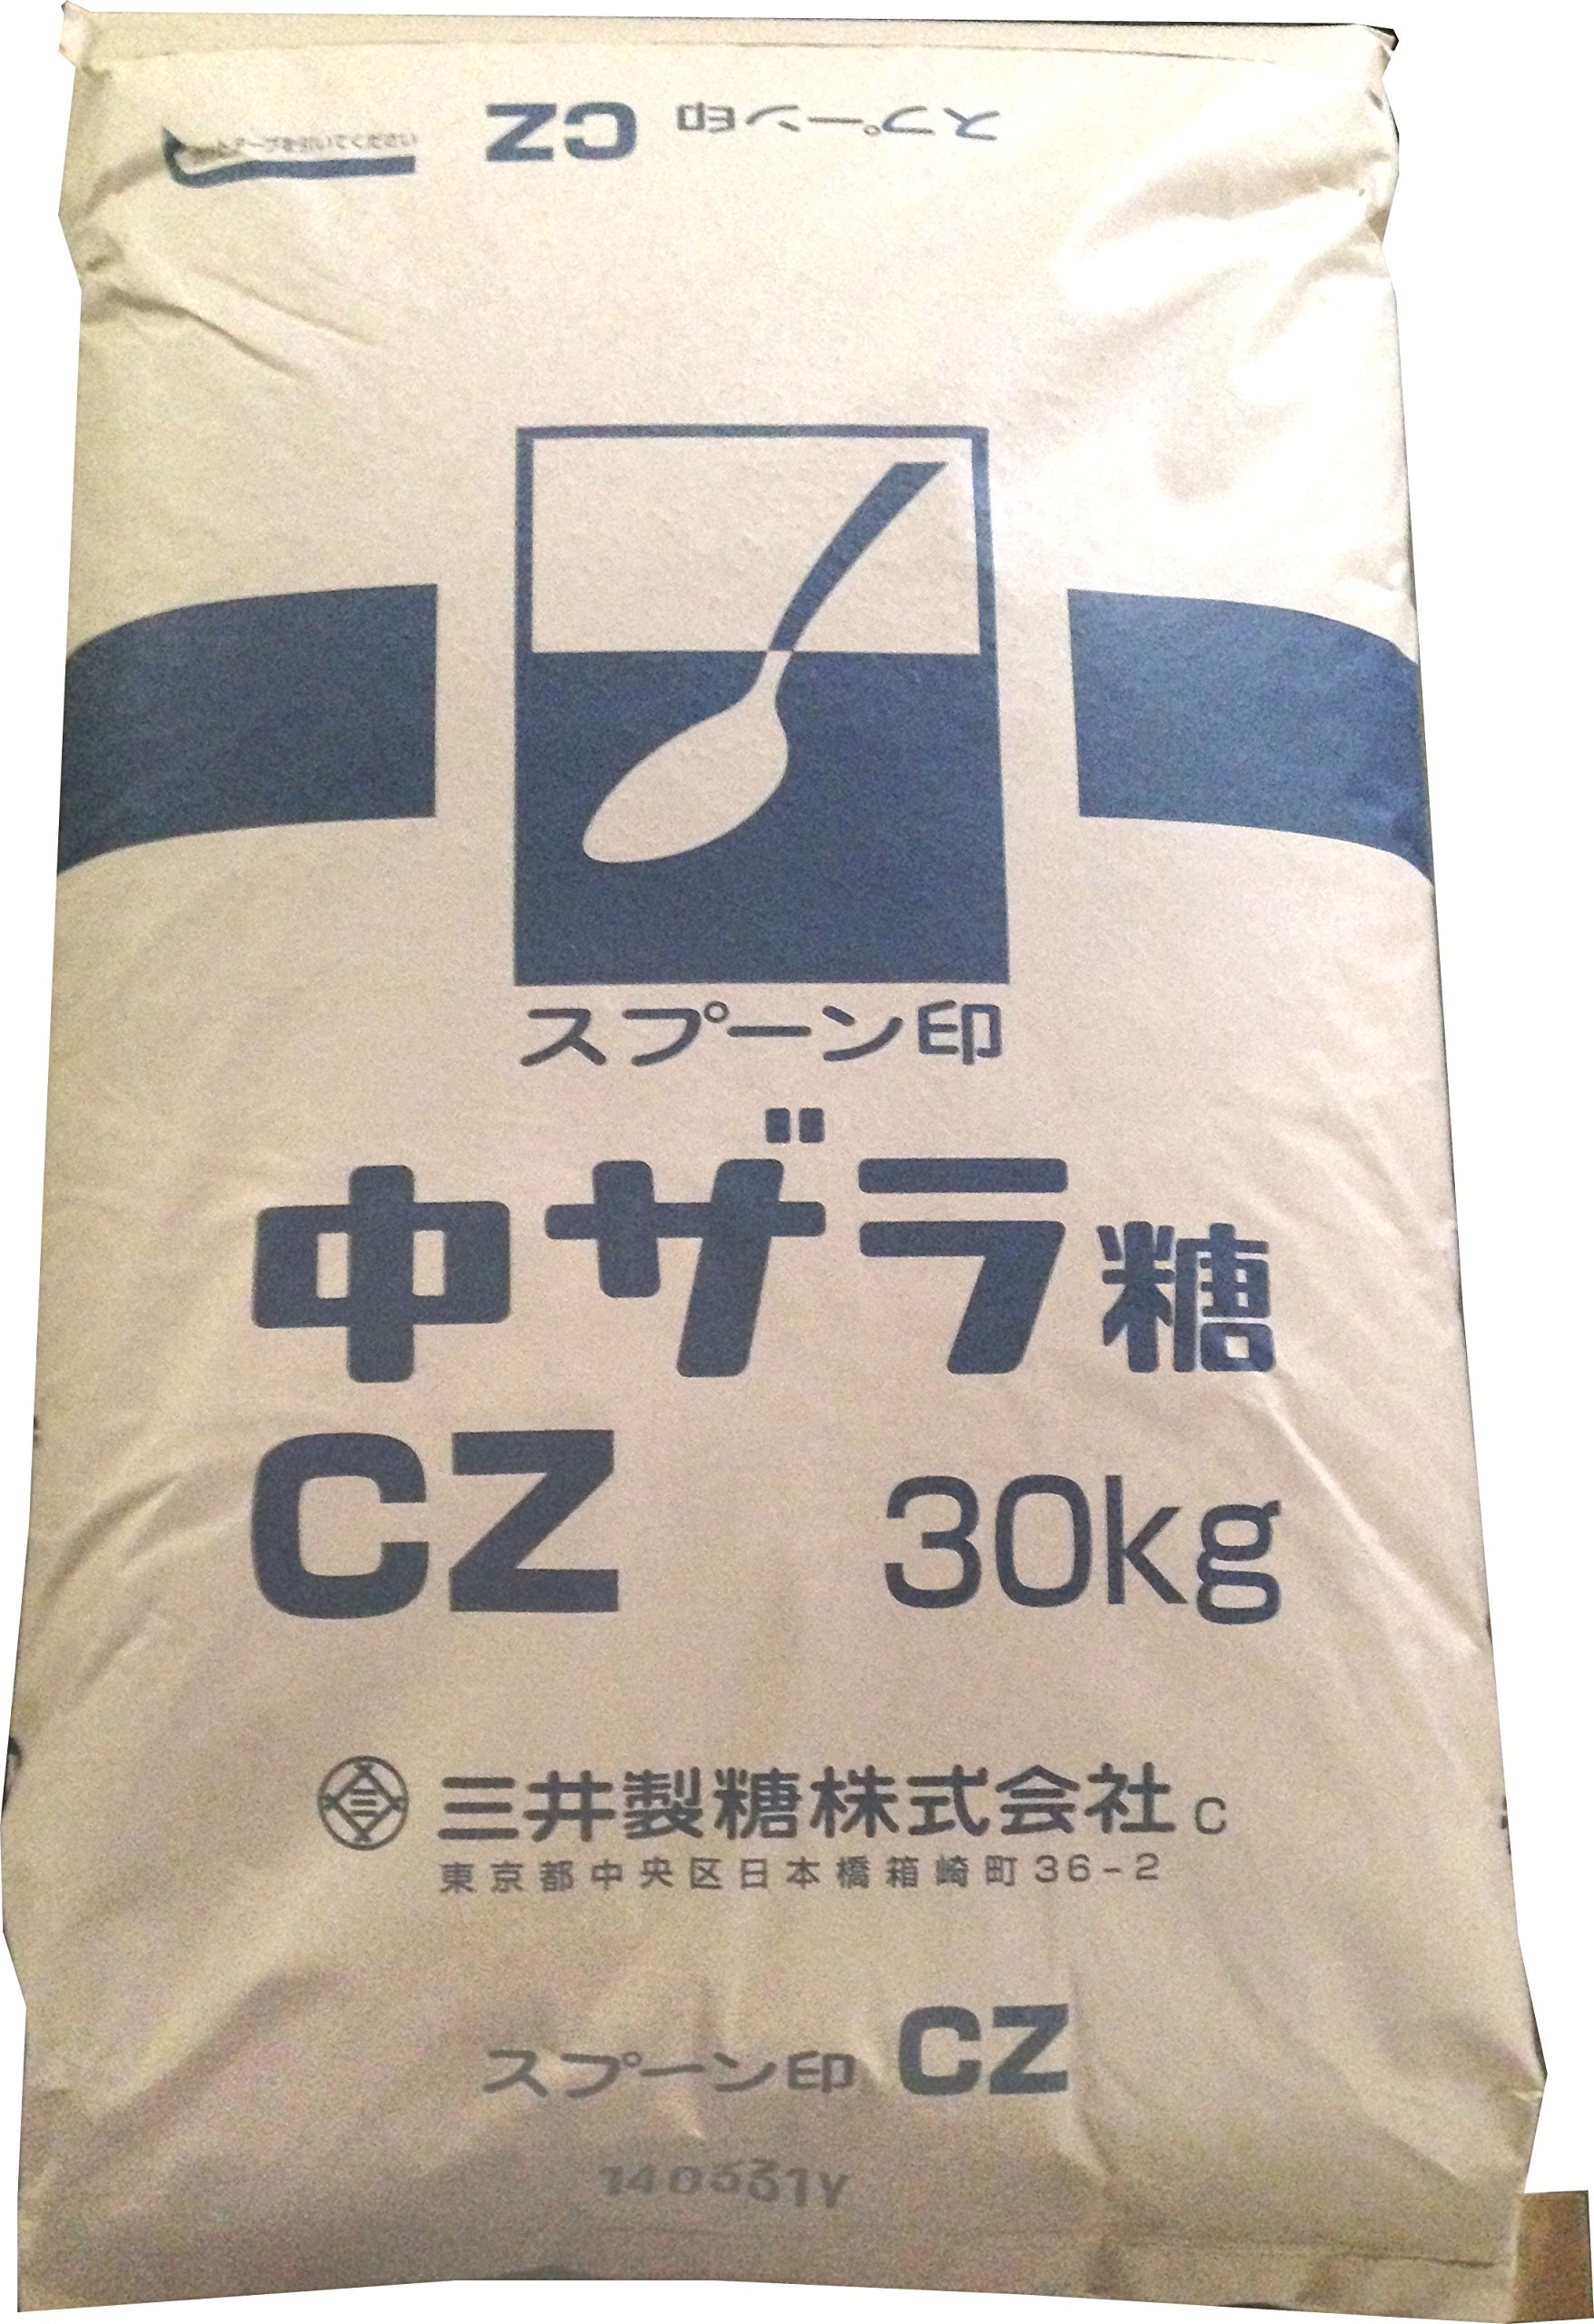 Spoon mark in Zara sugar 30kg